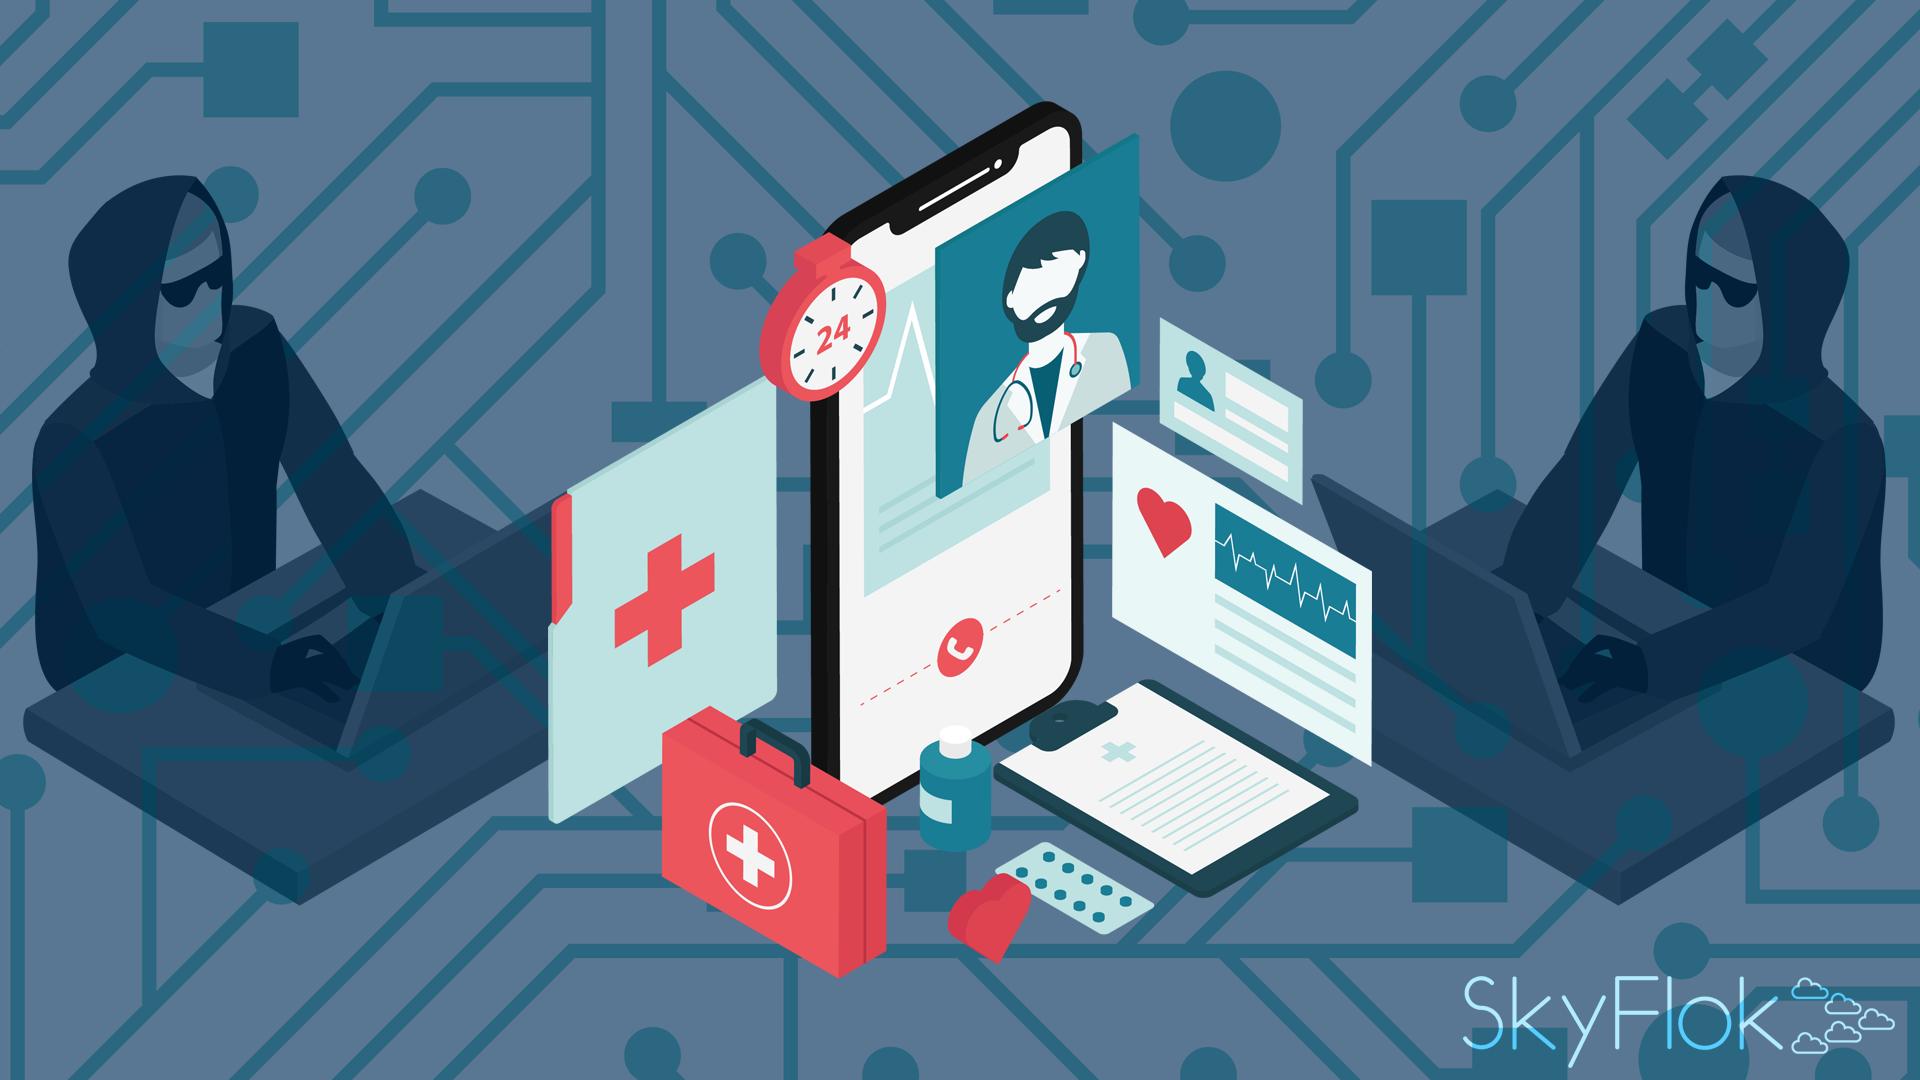 Healthcare Least Prepared for Ransomware Attacks